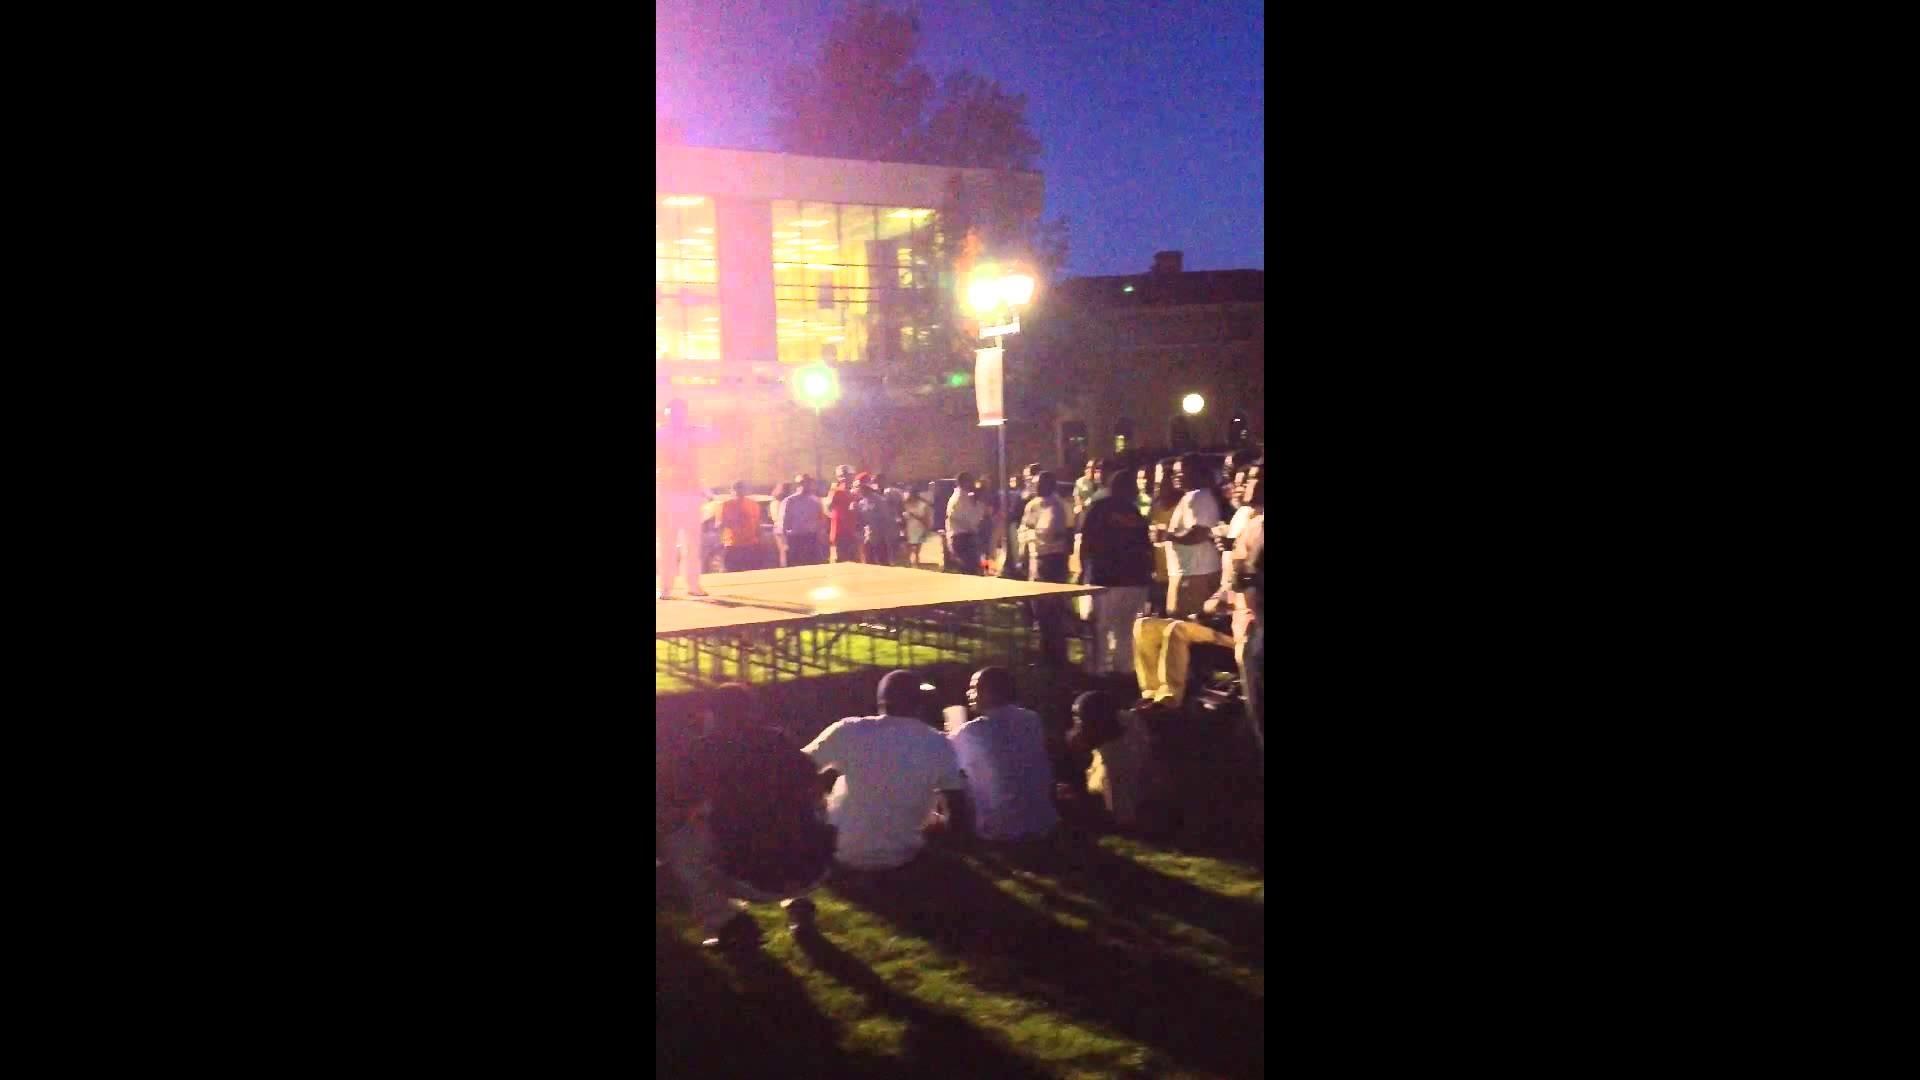 Omicron Psi Chapter of Alpha Phi Alpha Spring 14 Probate Delta State  University